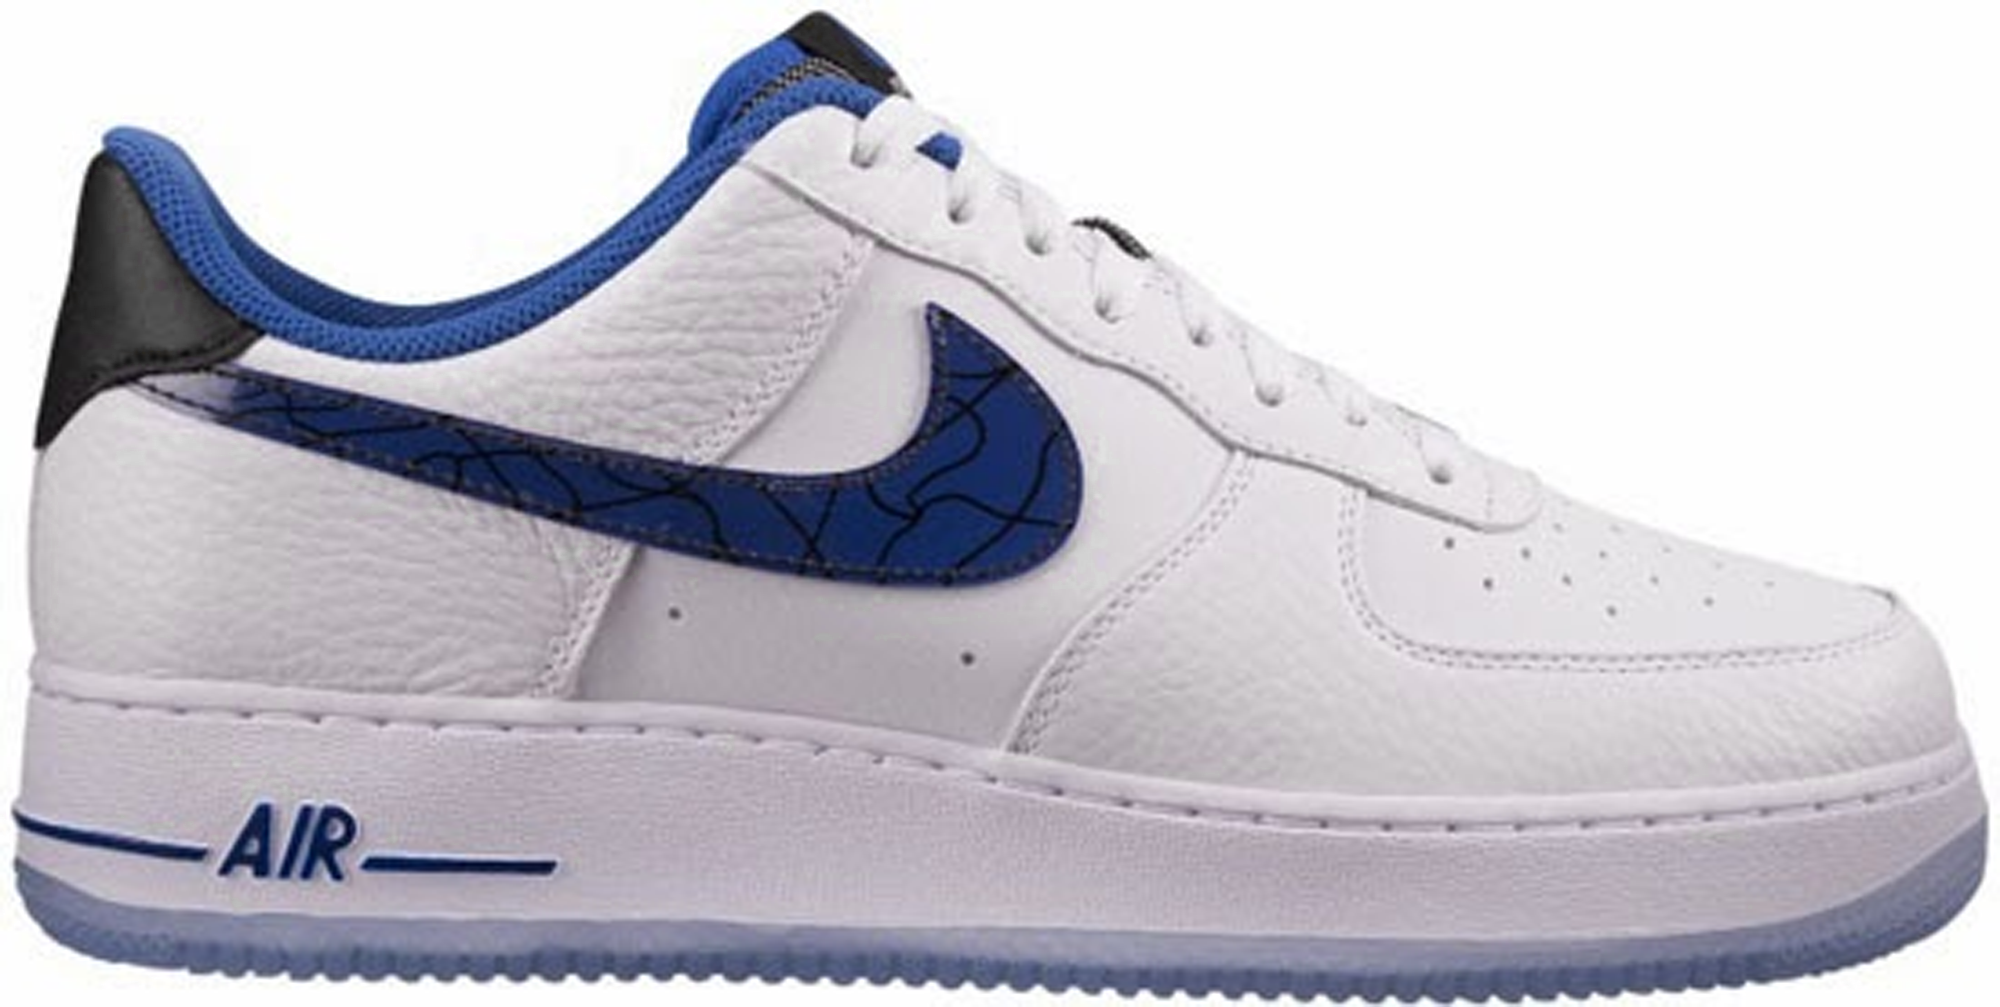 Nike Air Force 1 Low Penny Hardaway